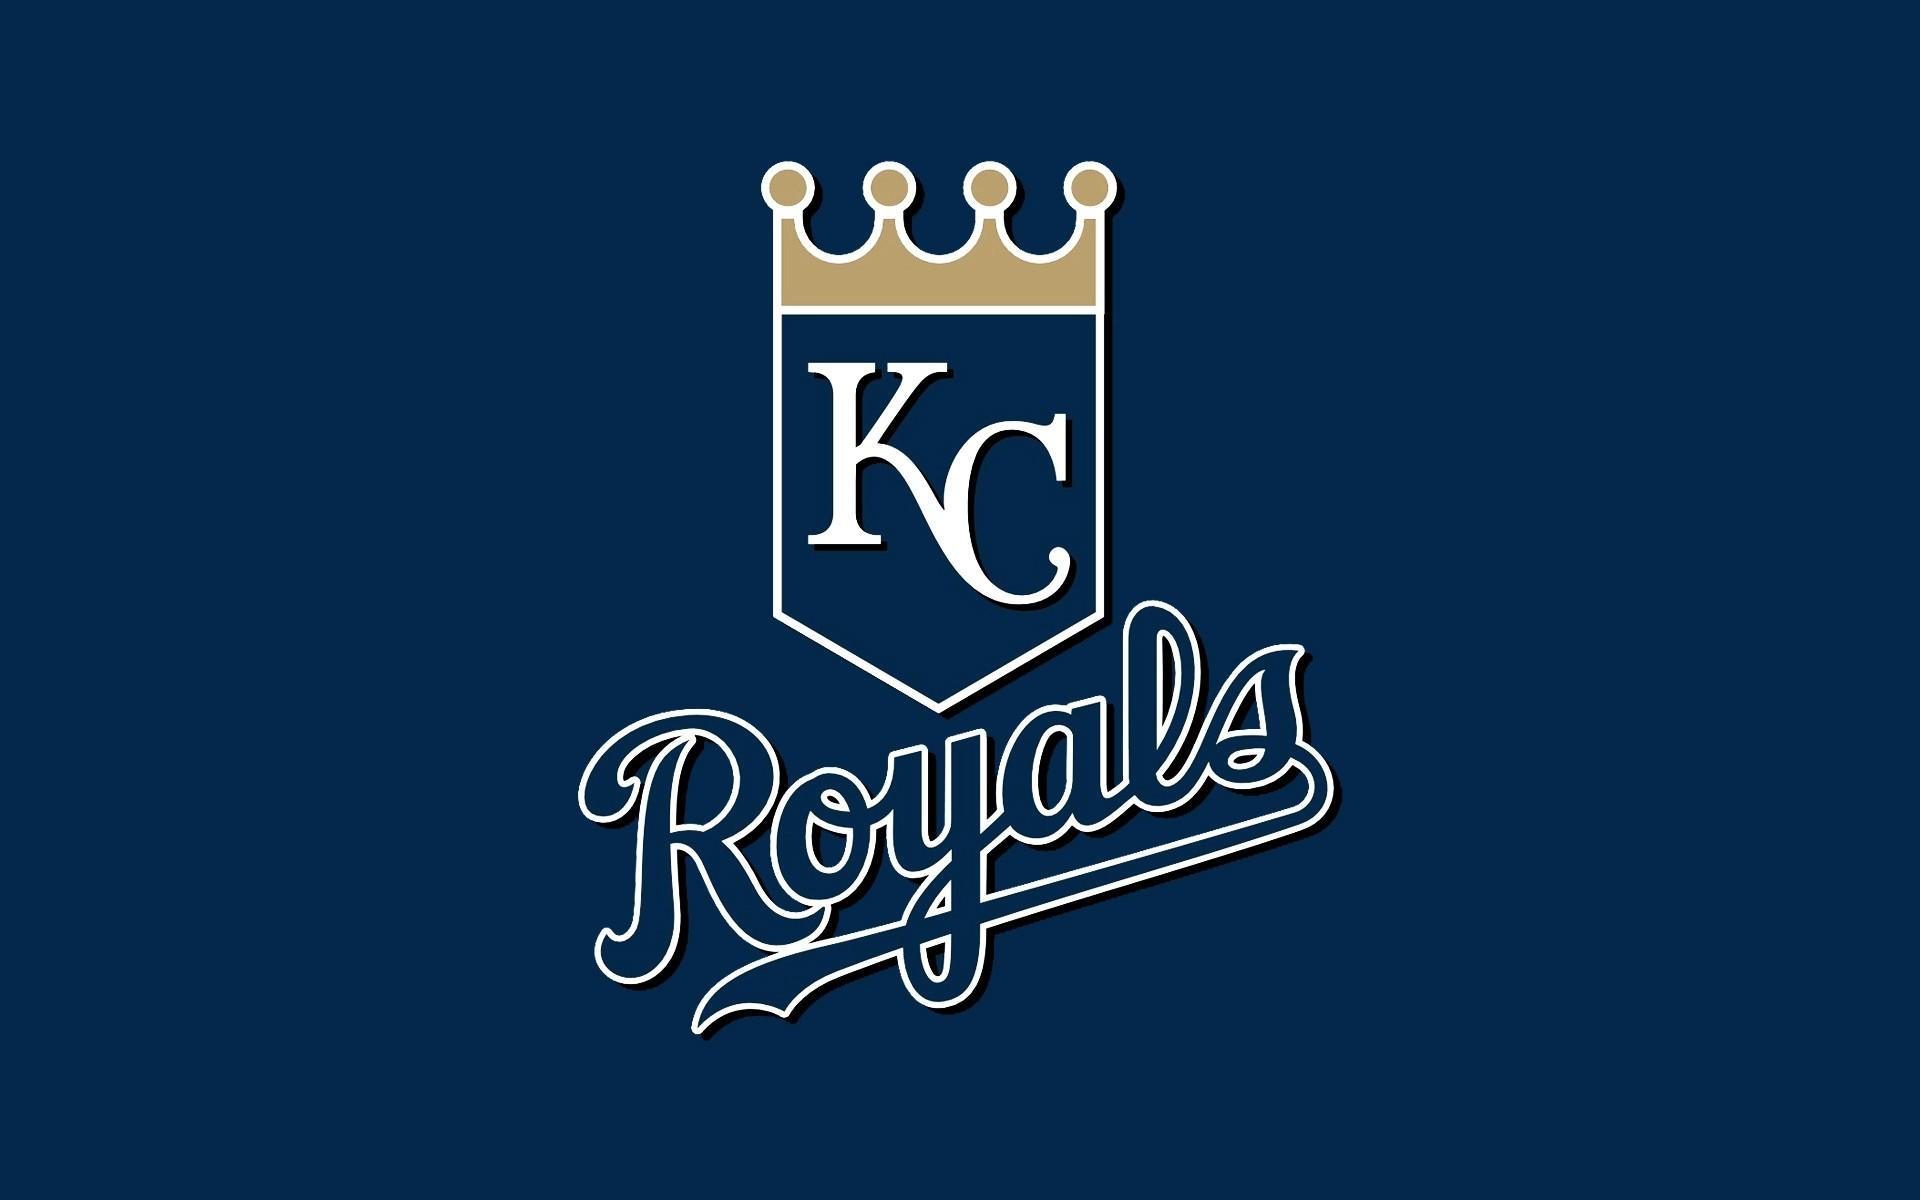 … Kansas City Royals Wallpaper 2017 …